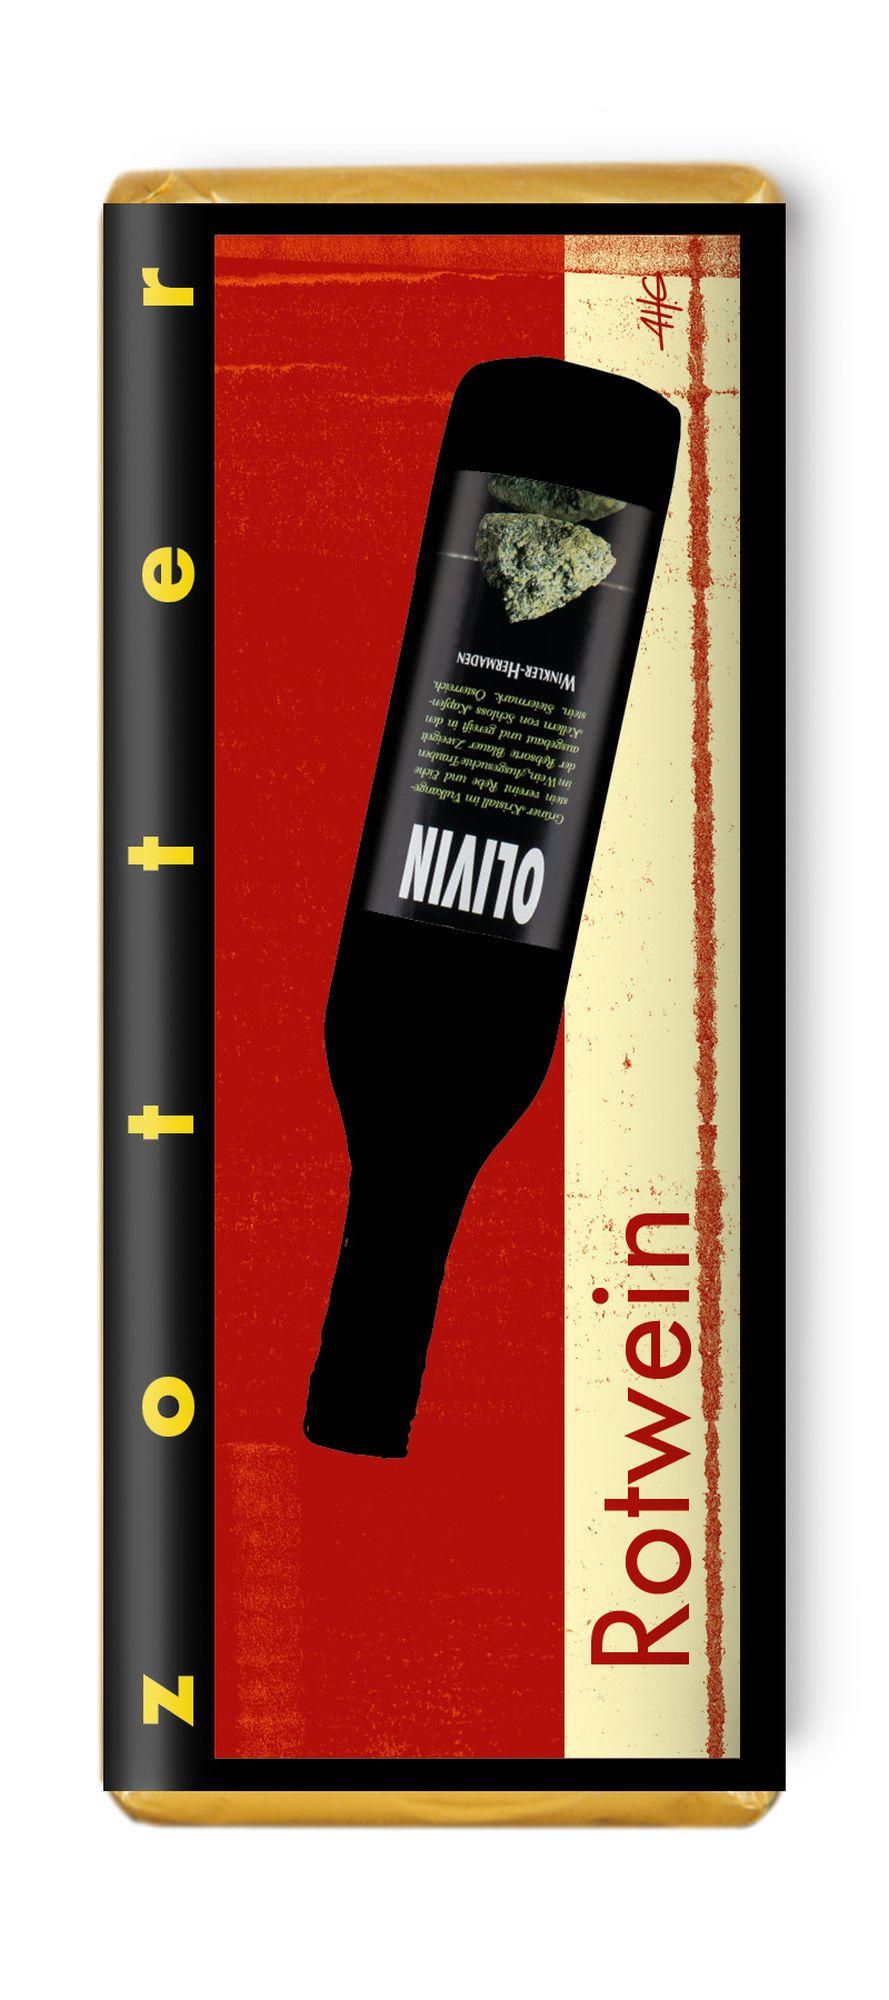 Czekolada nadziewana zotter red wine olivin